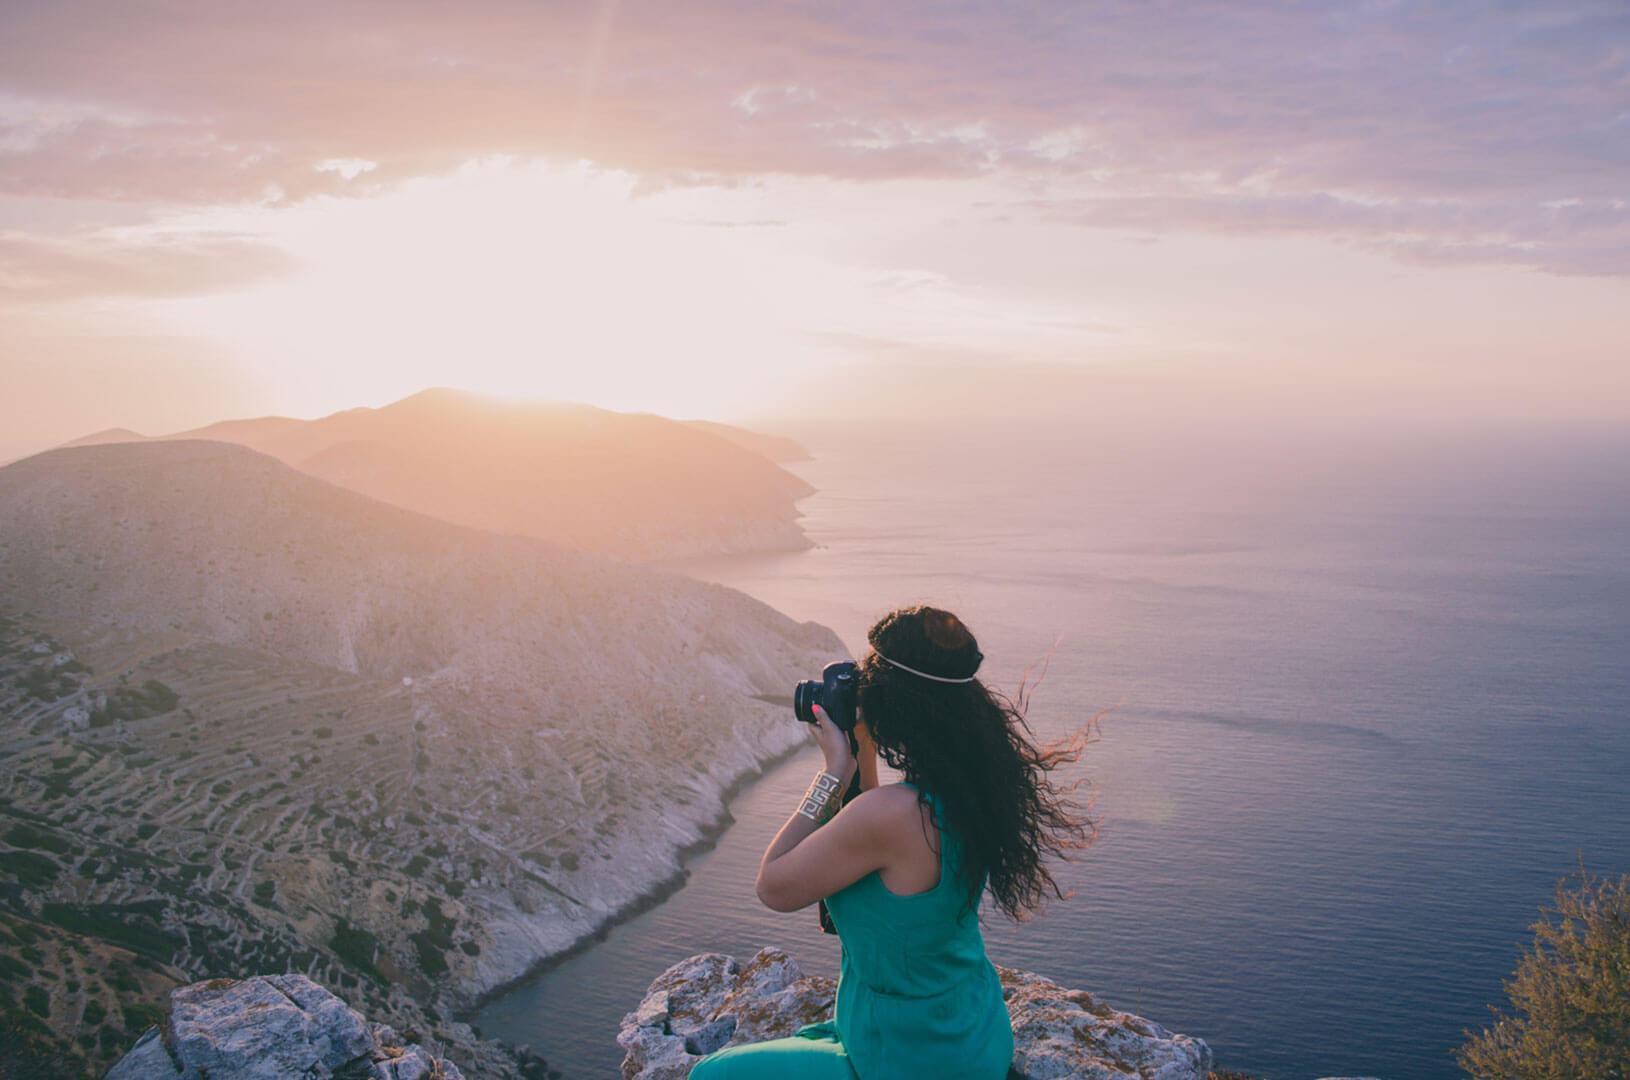 folegandros-cyclades-greece-la-vie-en-blog-all-rights-reserved4